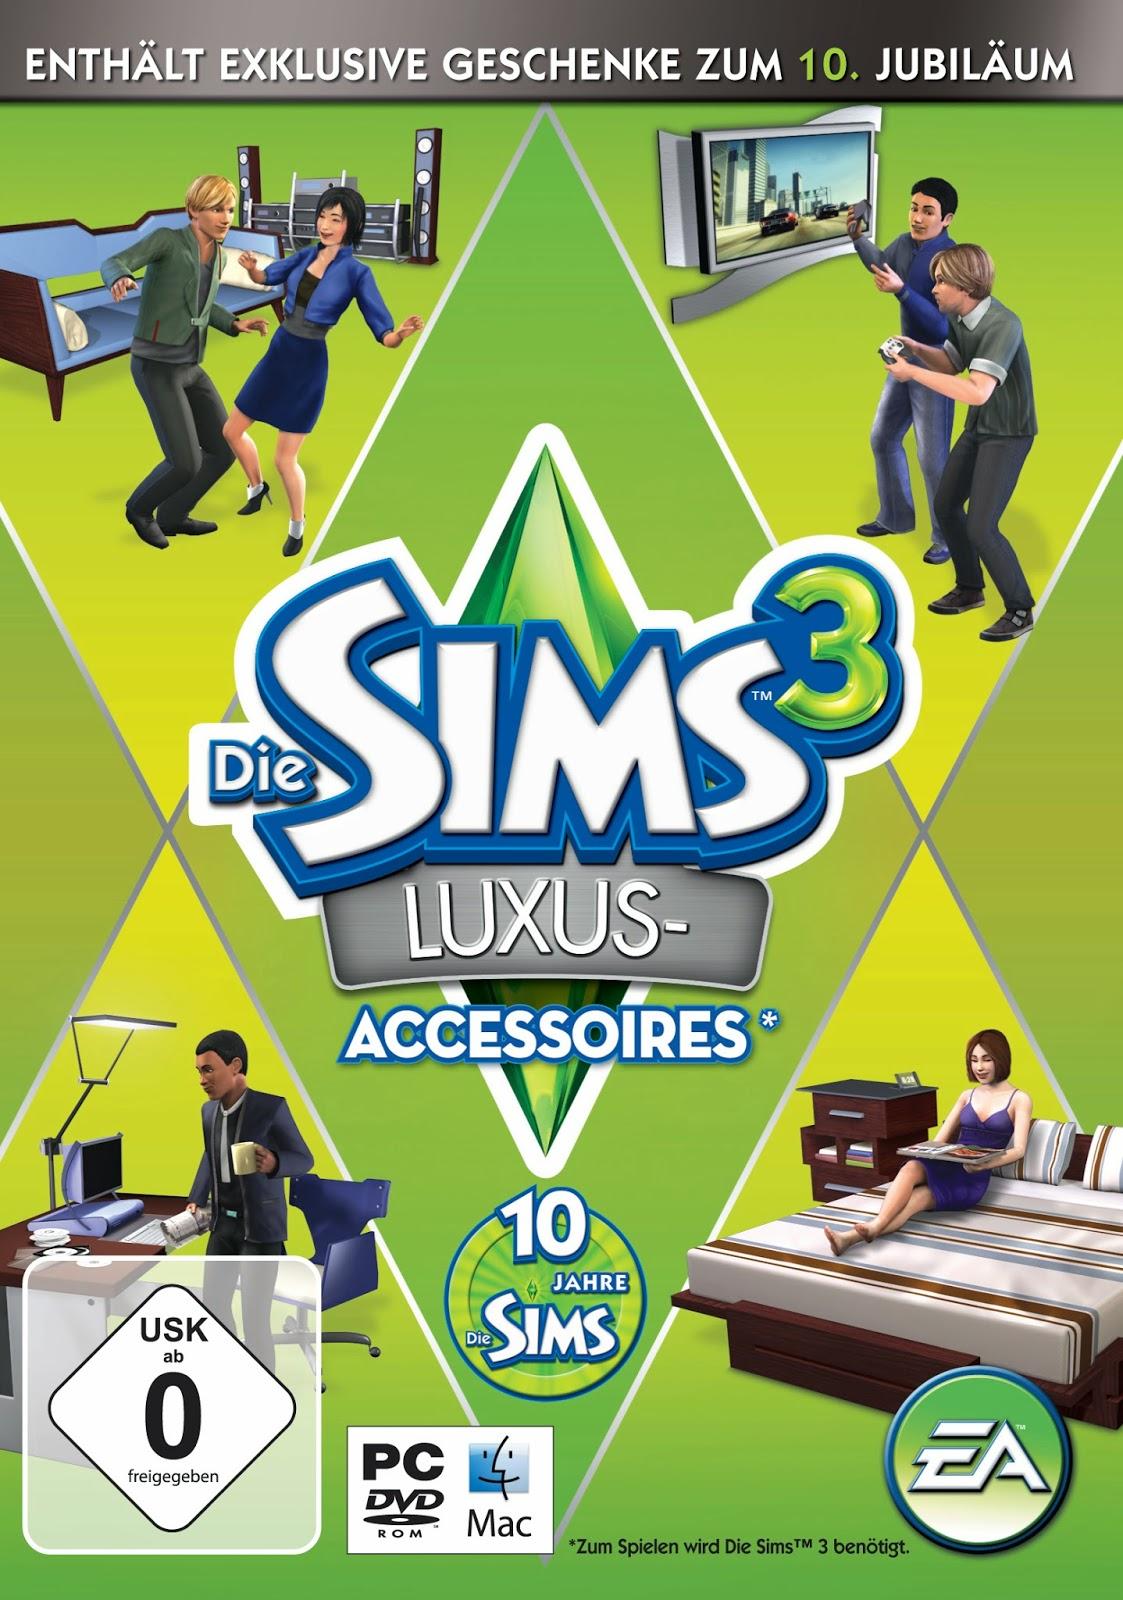 http://www.amazon.de/Die-Sims-Luxus-Accessoires-Online/dp/B007LTOVYY/ref=sr_1_2?ie=UTF8&qid=1405947020&sr=8-2&keywords=Die+Sims+3+-+Luxus-Accessoires